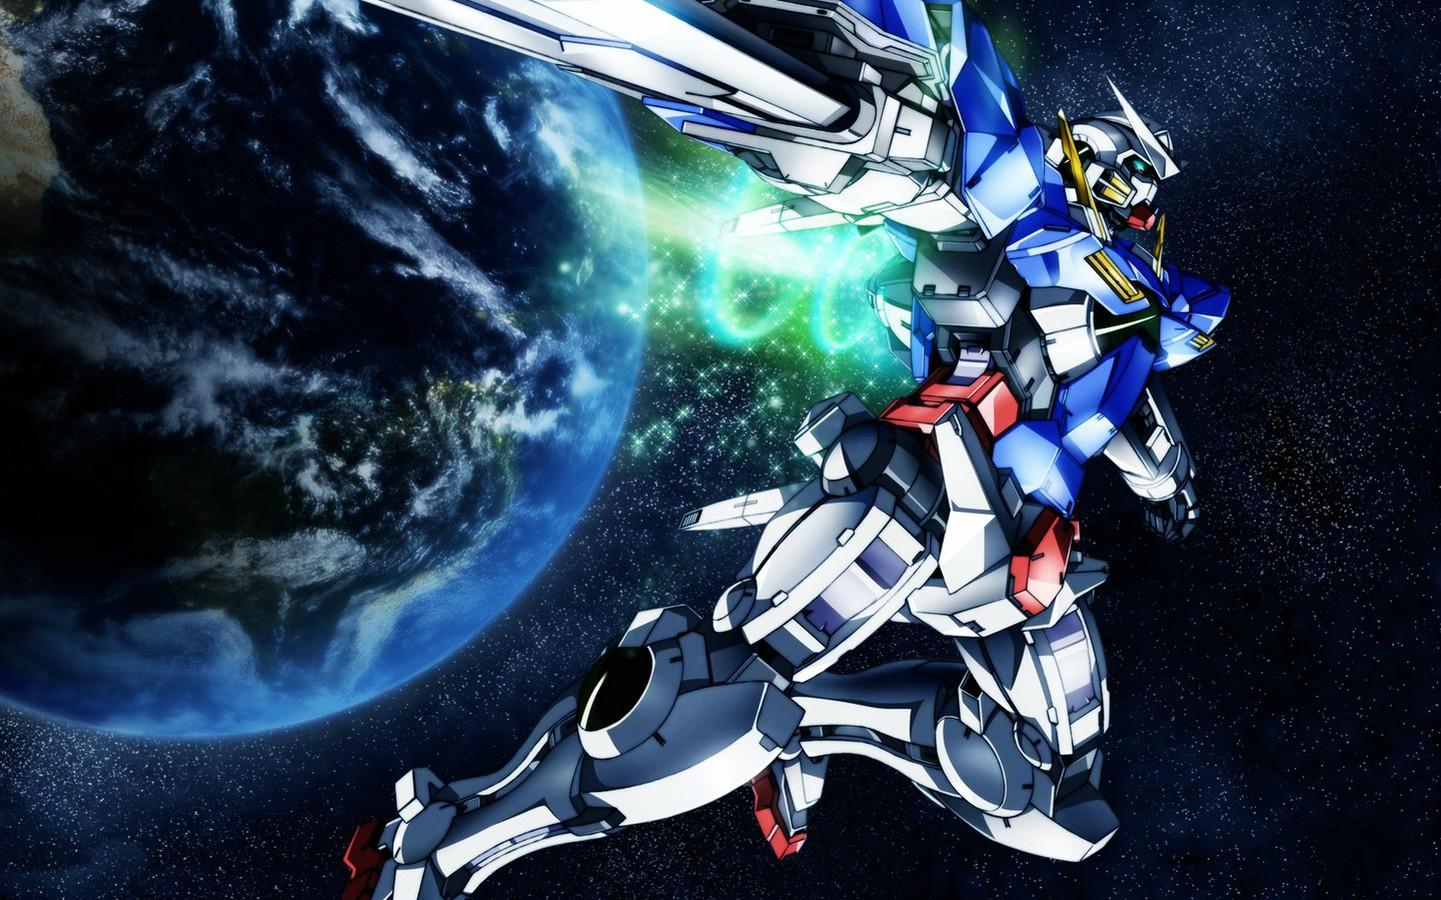 Gundam Exia Wallpaper ftw   Imgur 1441x900